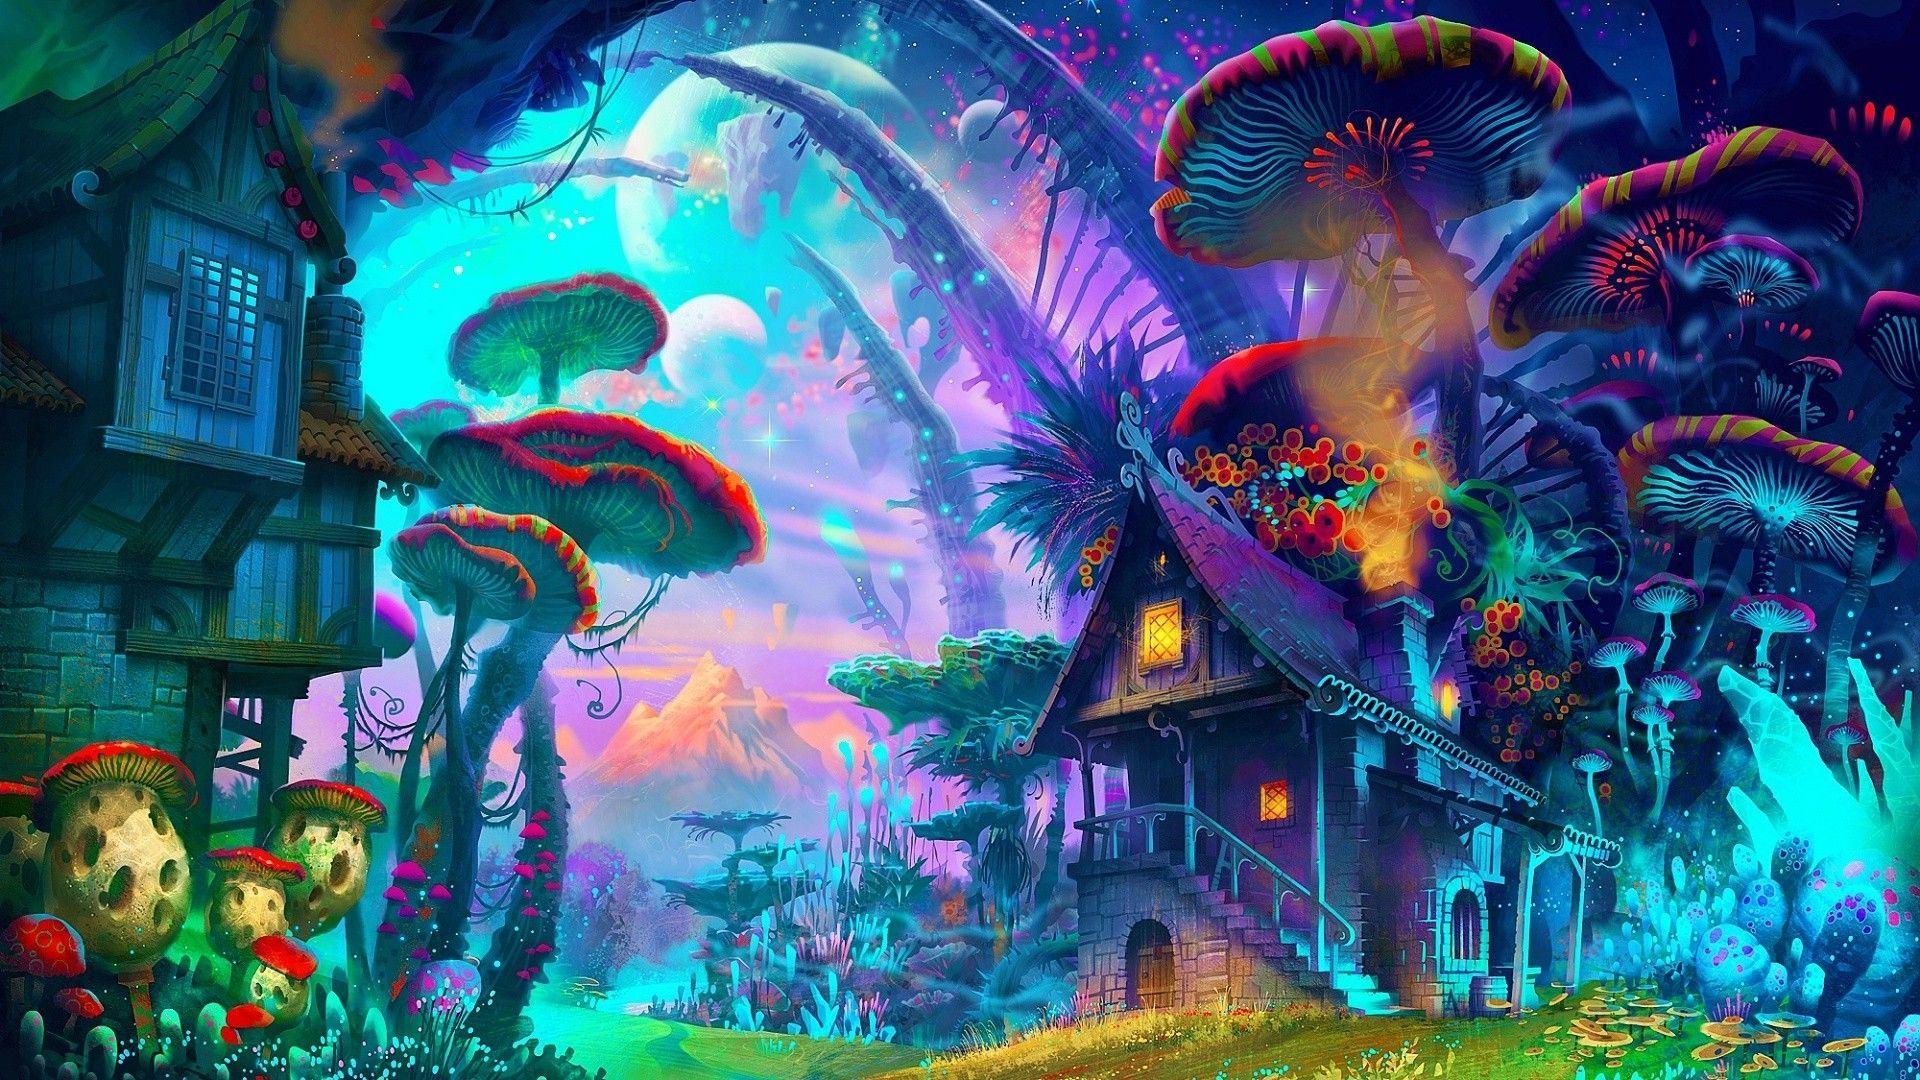 Trippy Mushroom Wallpapers Top Free Trippy Mushroom Backgrounds